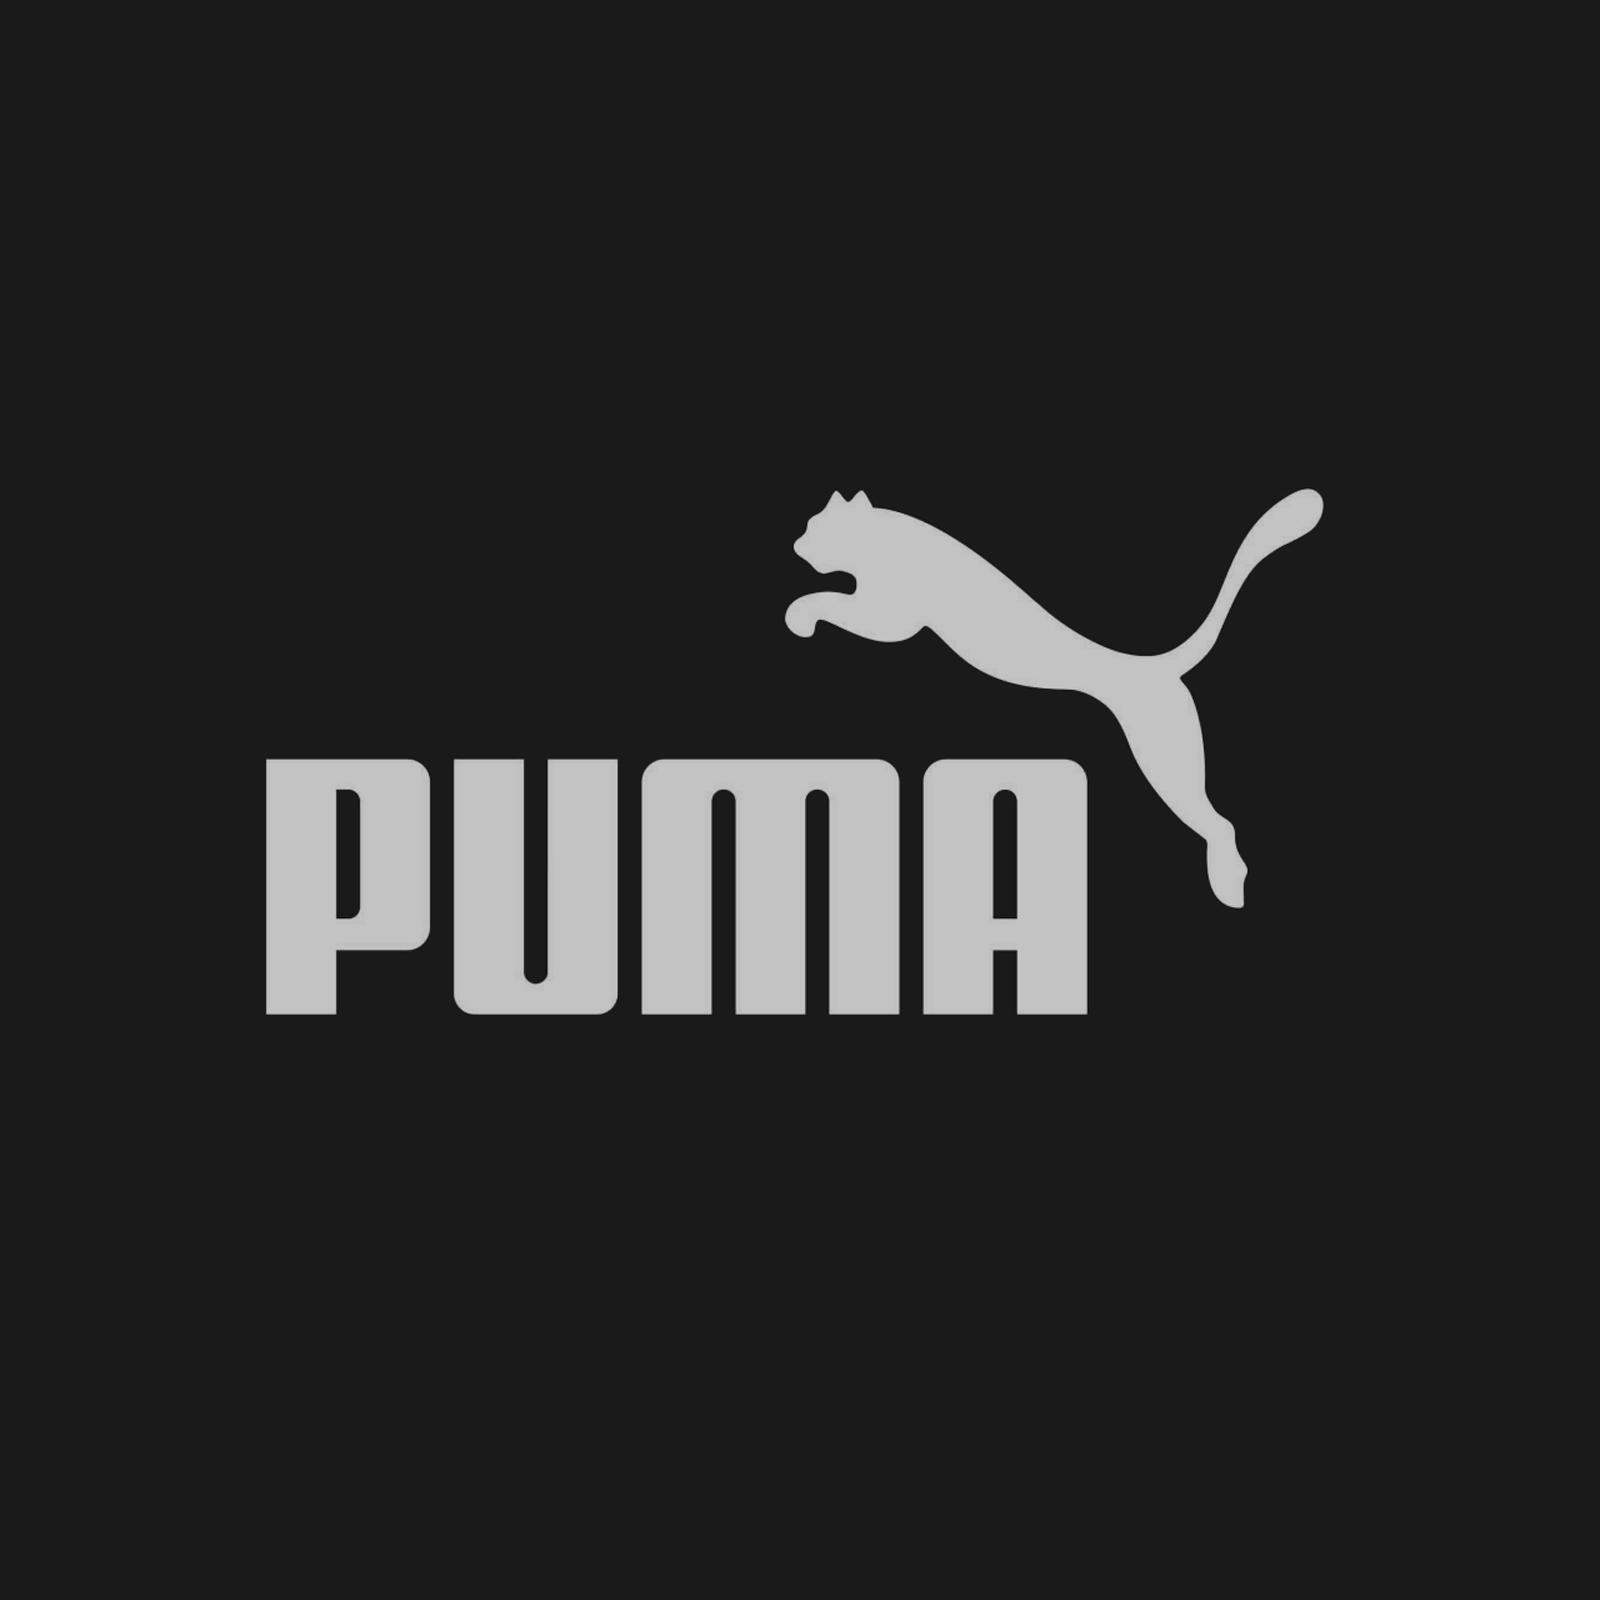 puma-wallpapers-hd-73398-3073039